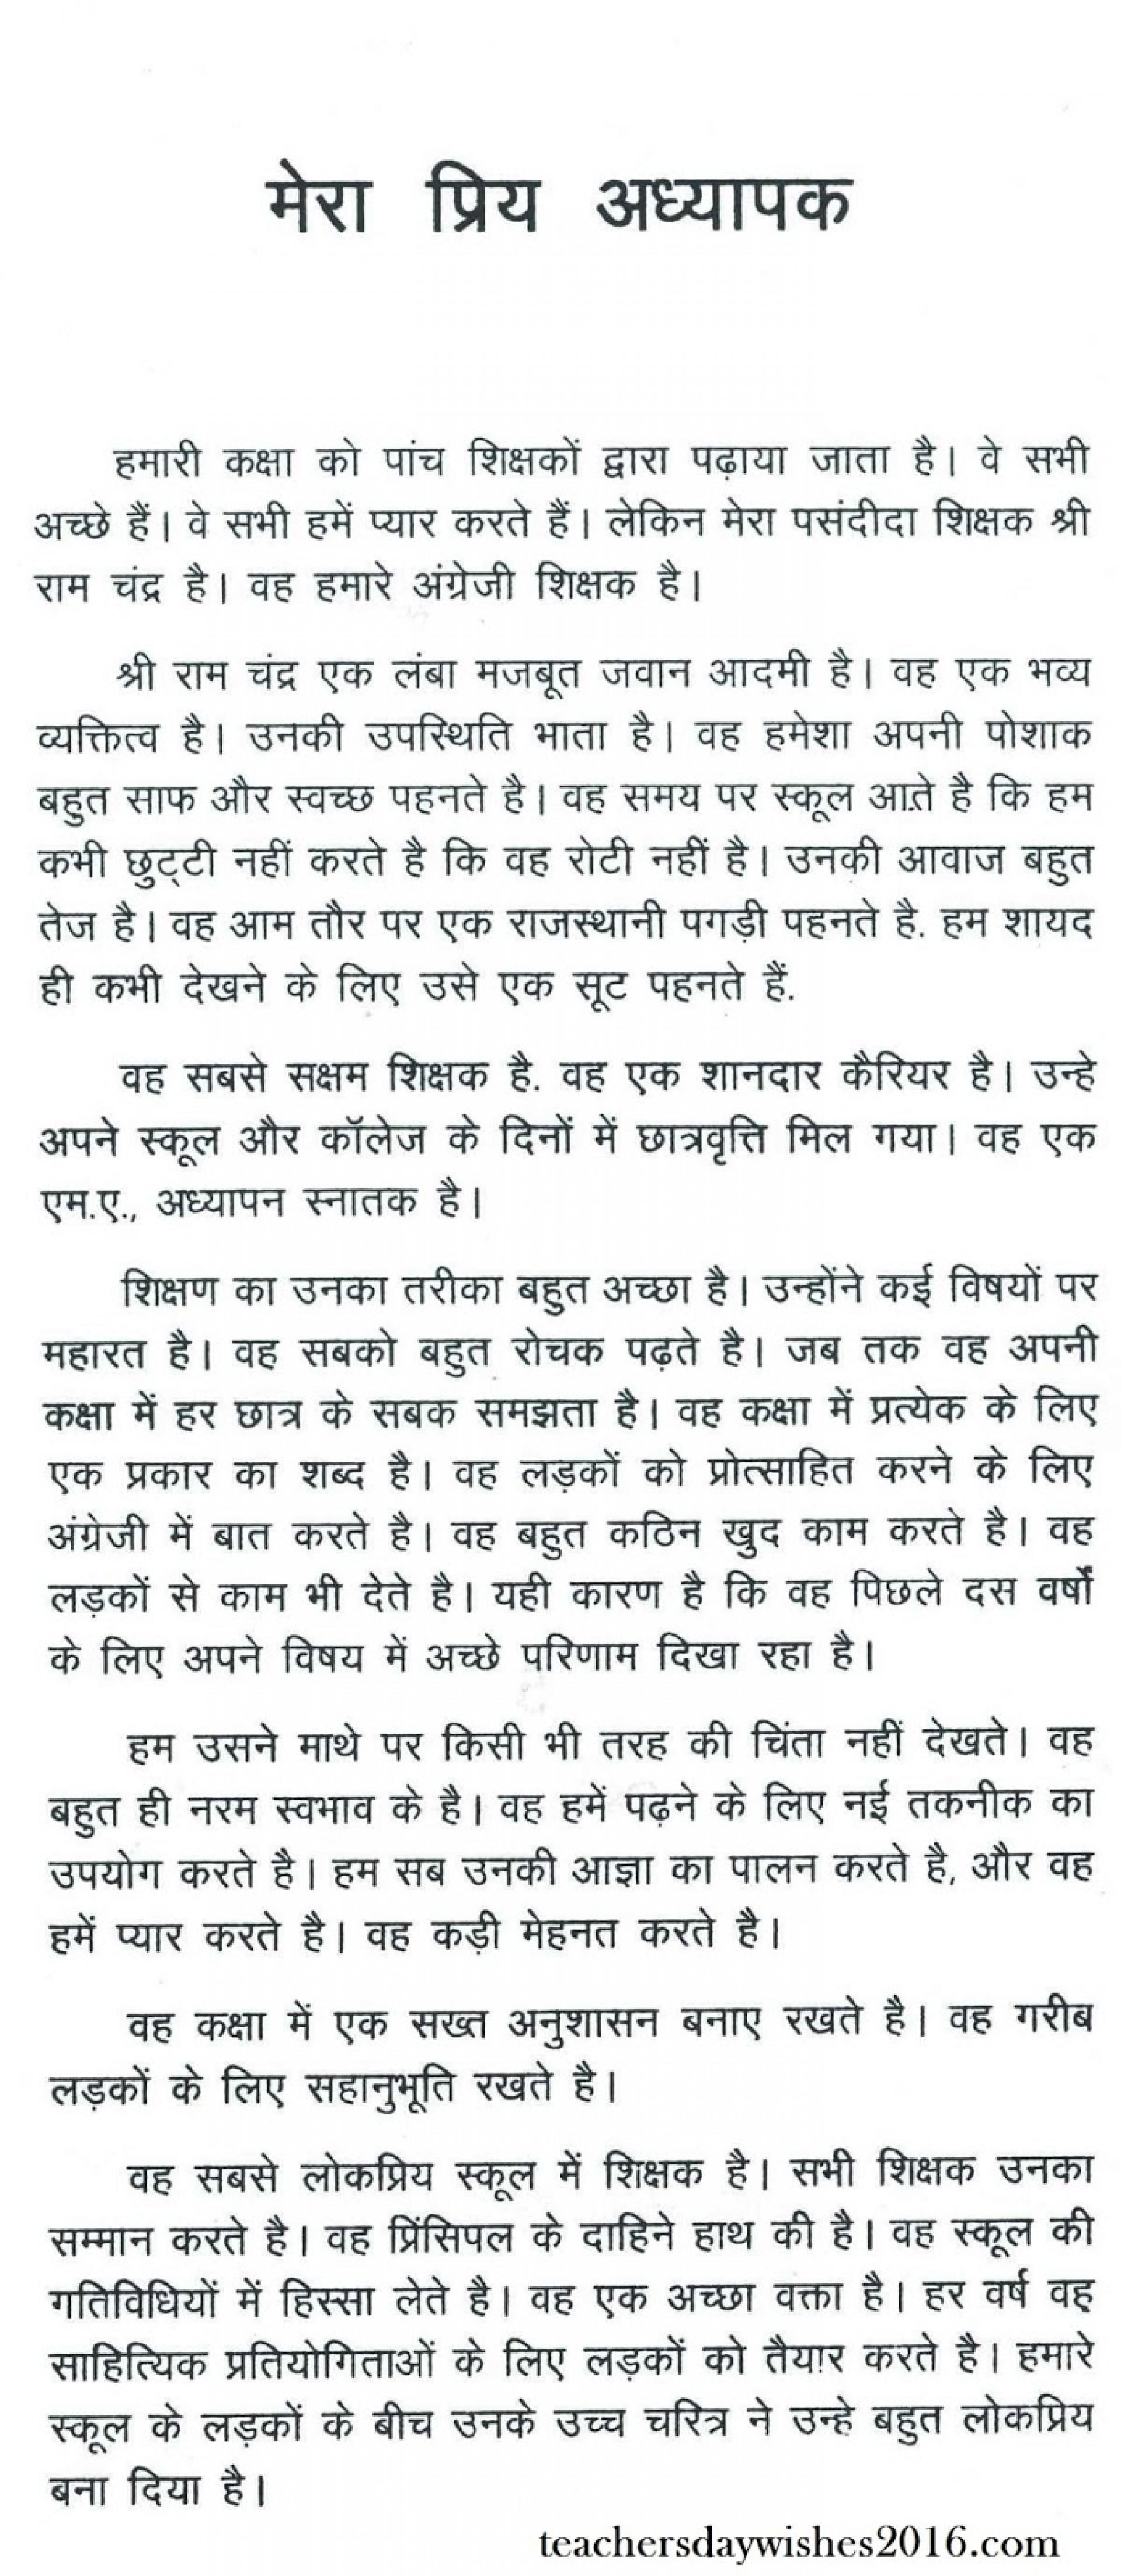 013 Essay On Teacher Example 10005 Thumb Marvelous Teachers Day In Odia Argumentative Carrying Guns Importance Hindi 1920